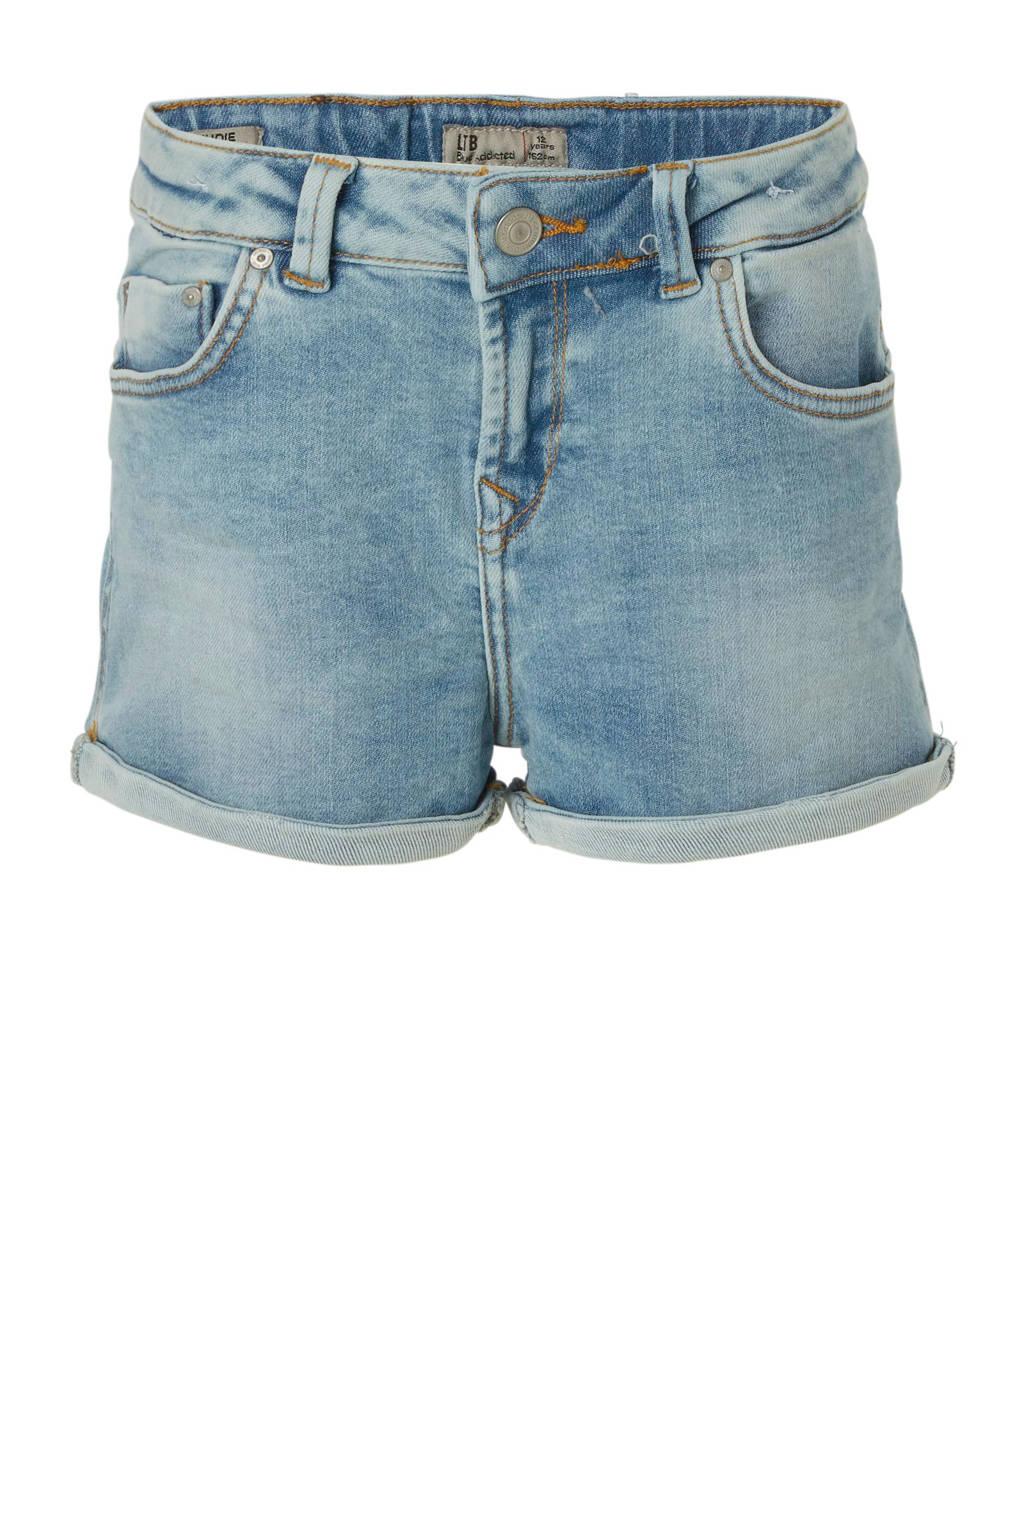 LTB jeans short Judie, Light denim